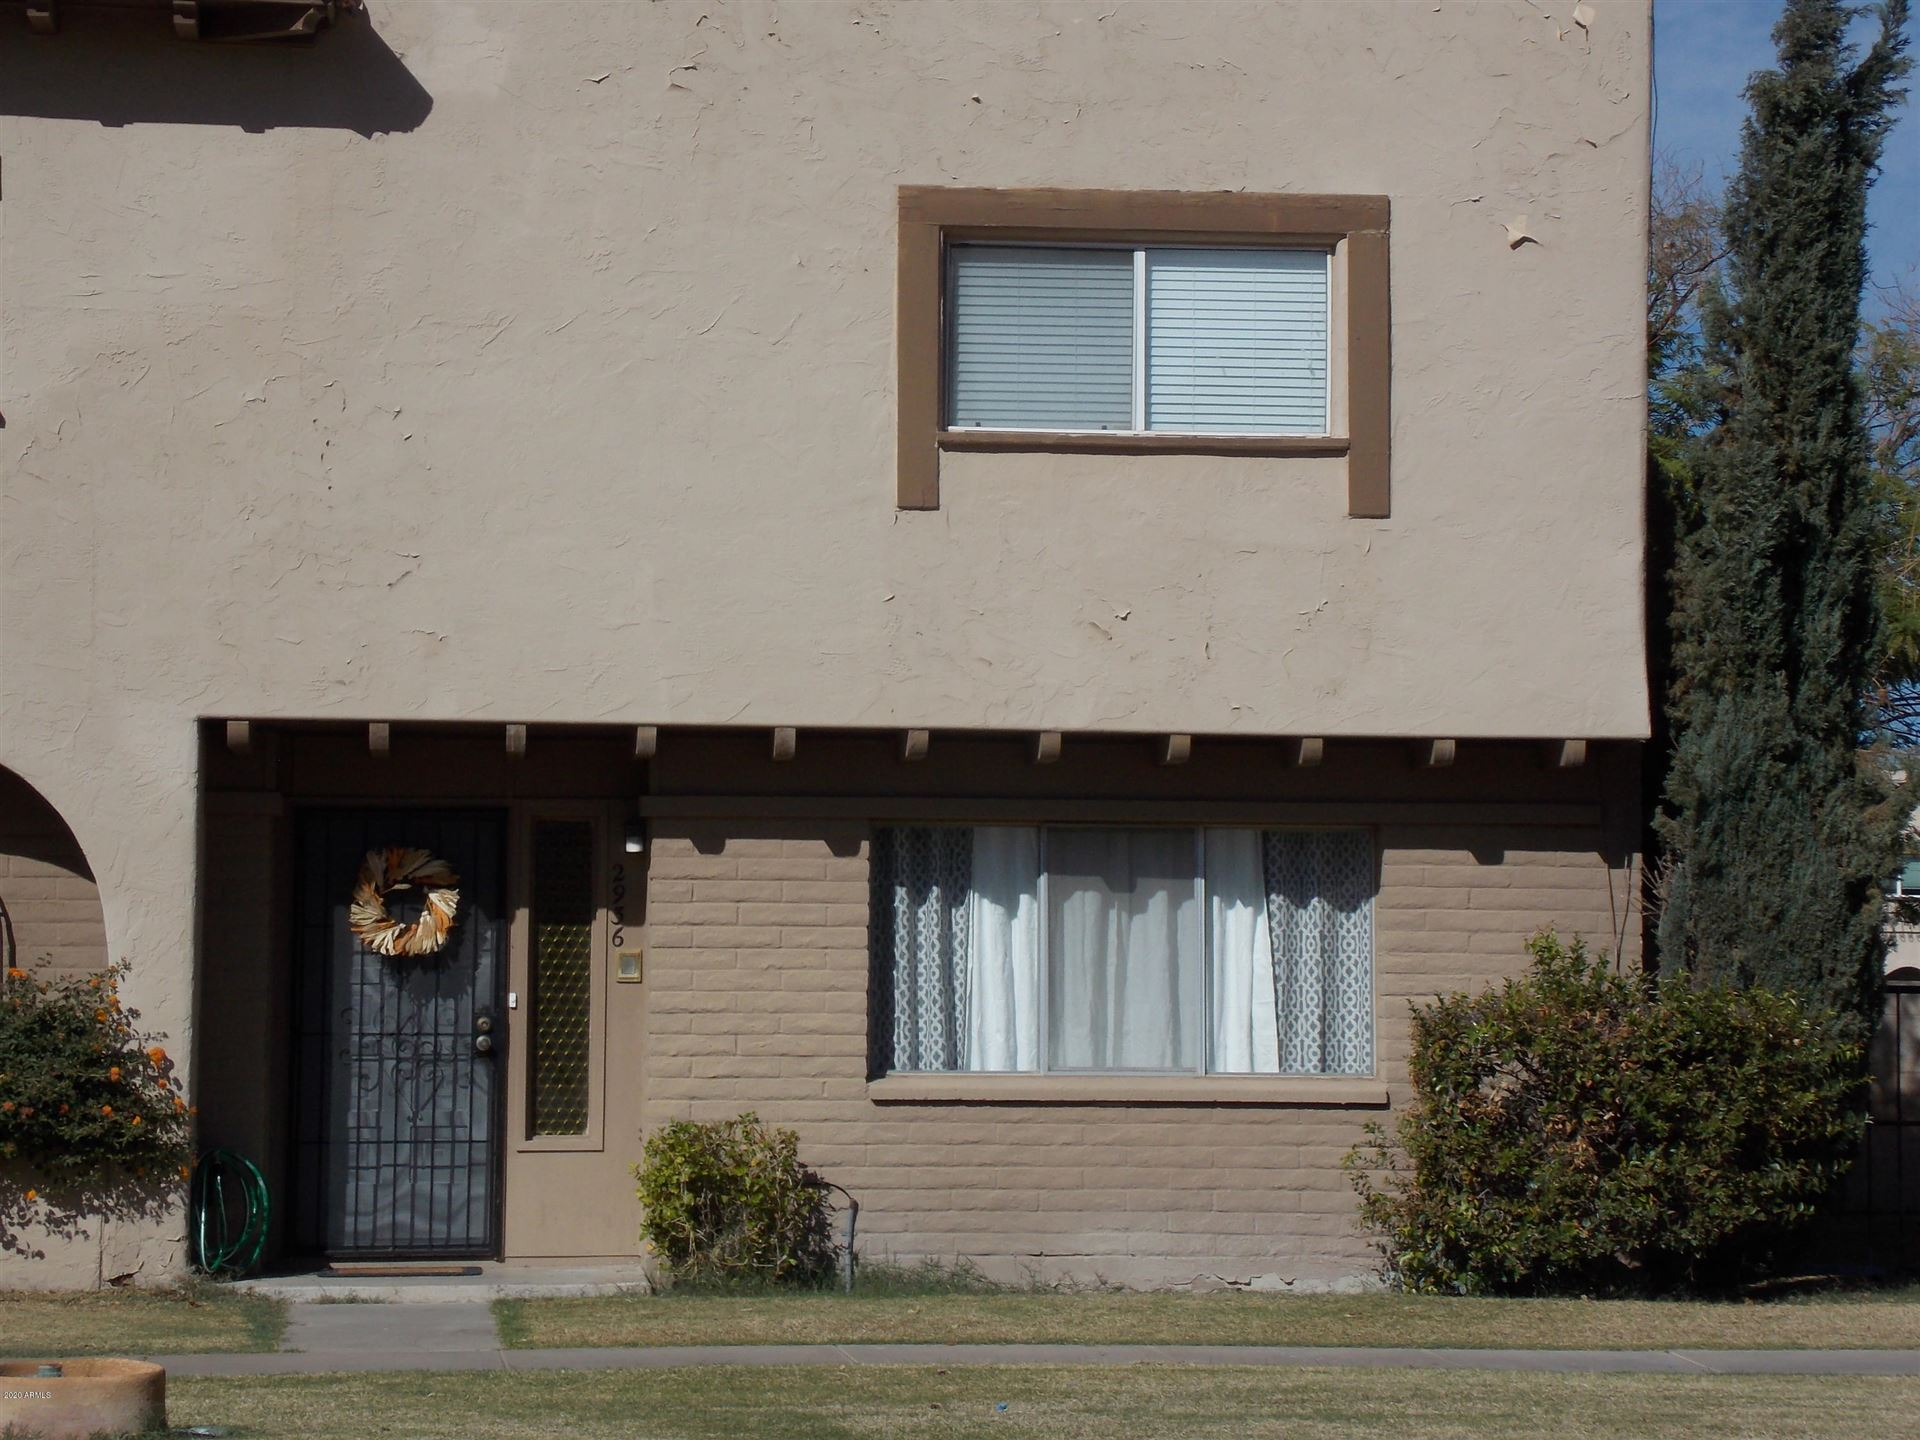 2936 E CLARENDON Avenue, Phoenix, AZ 85016 - MLS#: 6160666